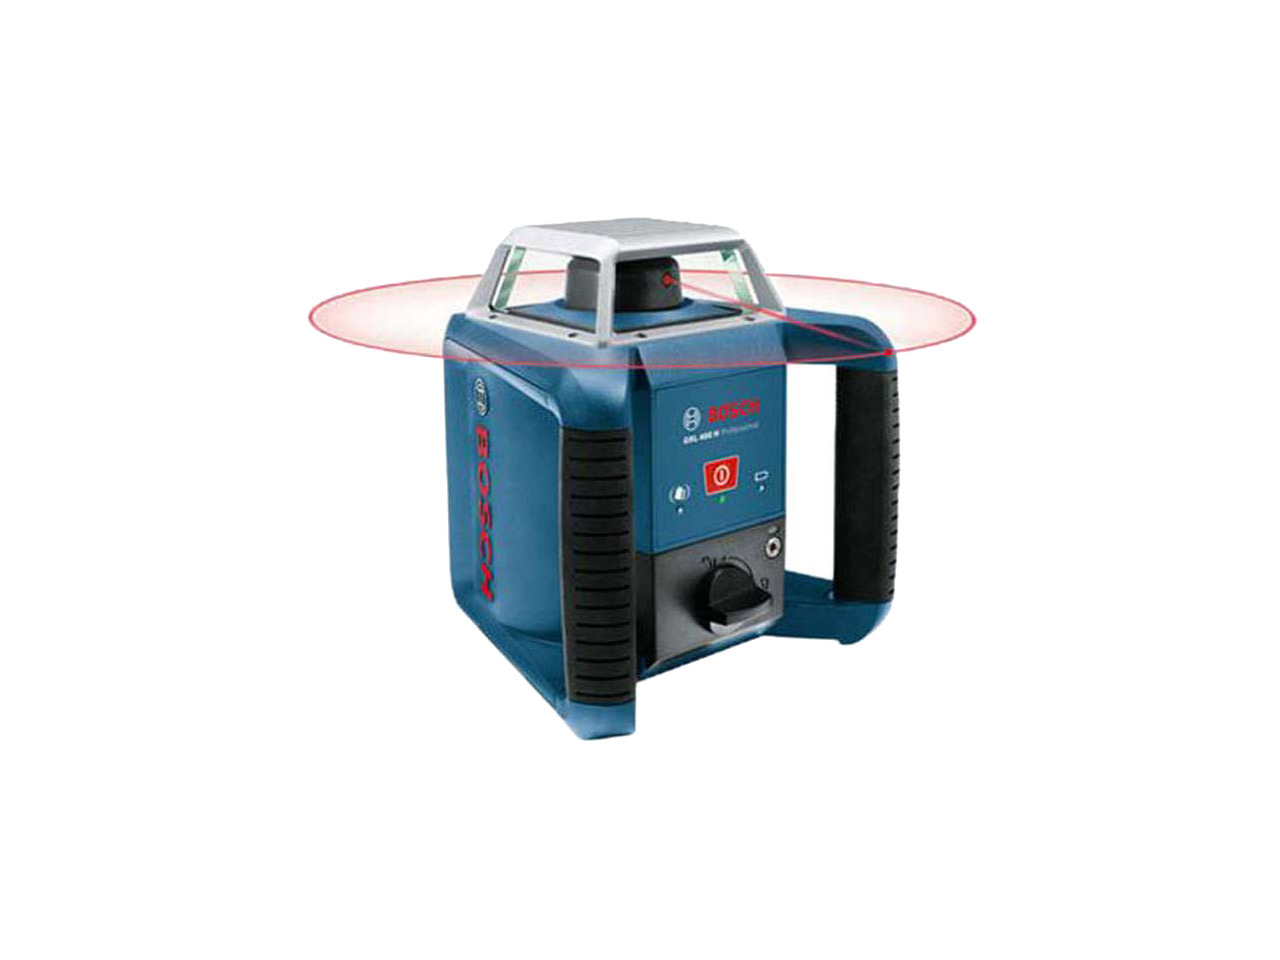 bosch grl400h170 au enbereich rotierende laser wasserwaage empf nger lr1 gr240 3165140900614 ebay. Black Bedroom Furniture Sets. Home Design Ideas